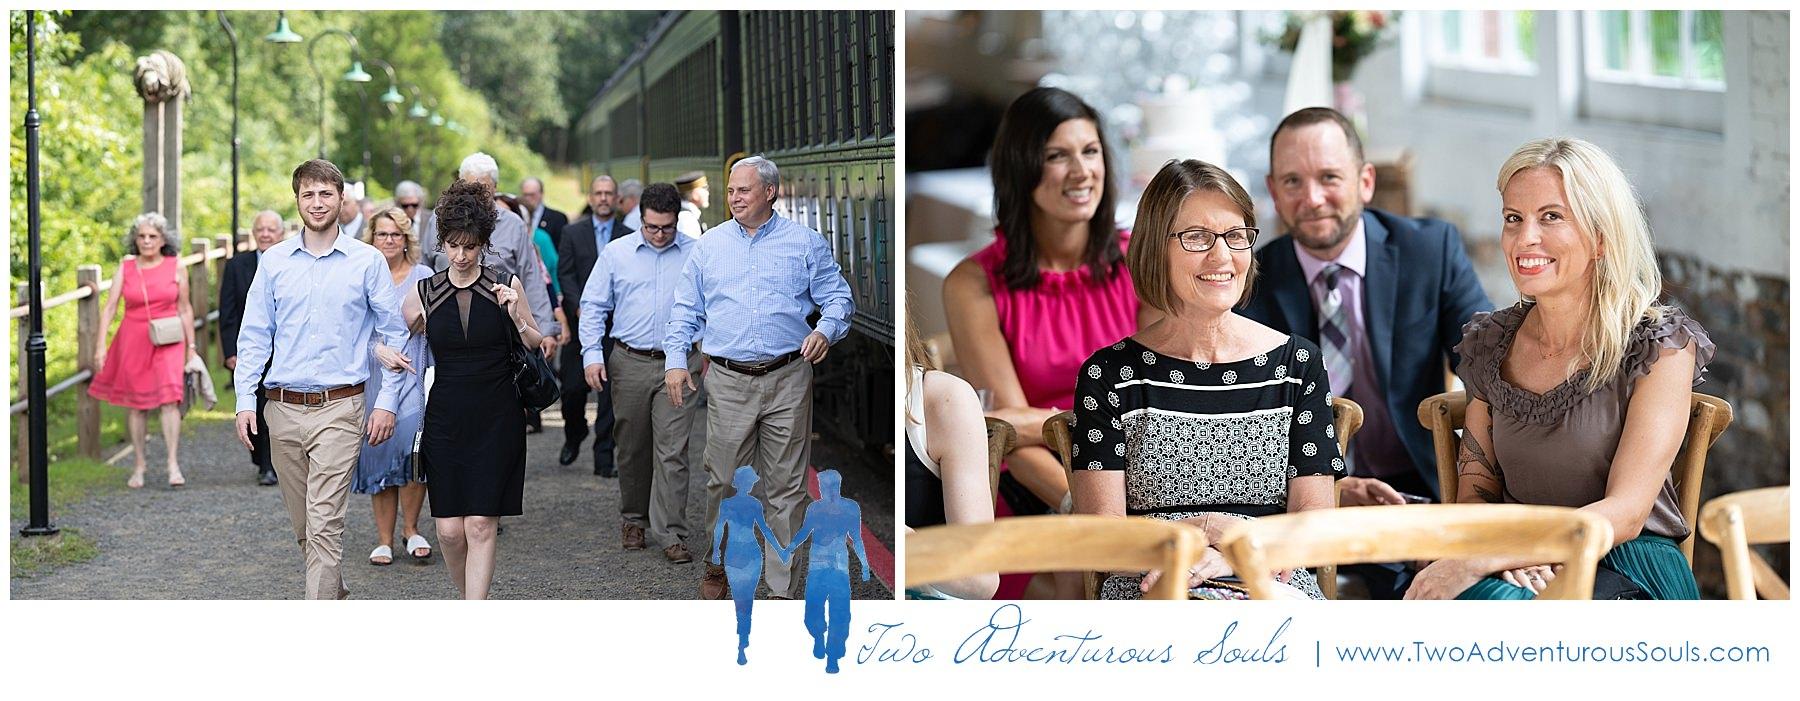 Connecticut Wedding Photographers, Lace Factory Wedding Photographers, Two Adventurous Souls - 083119_0032.jpg